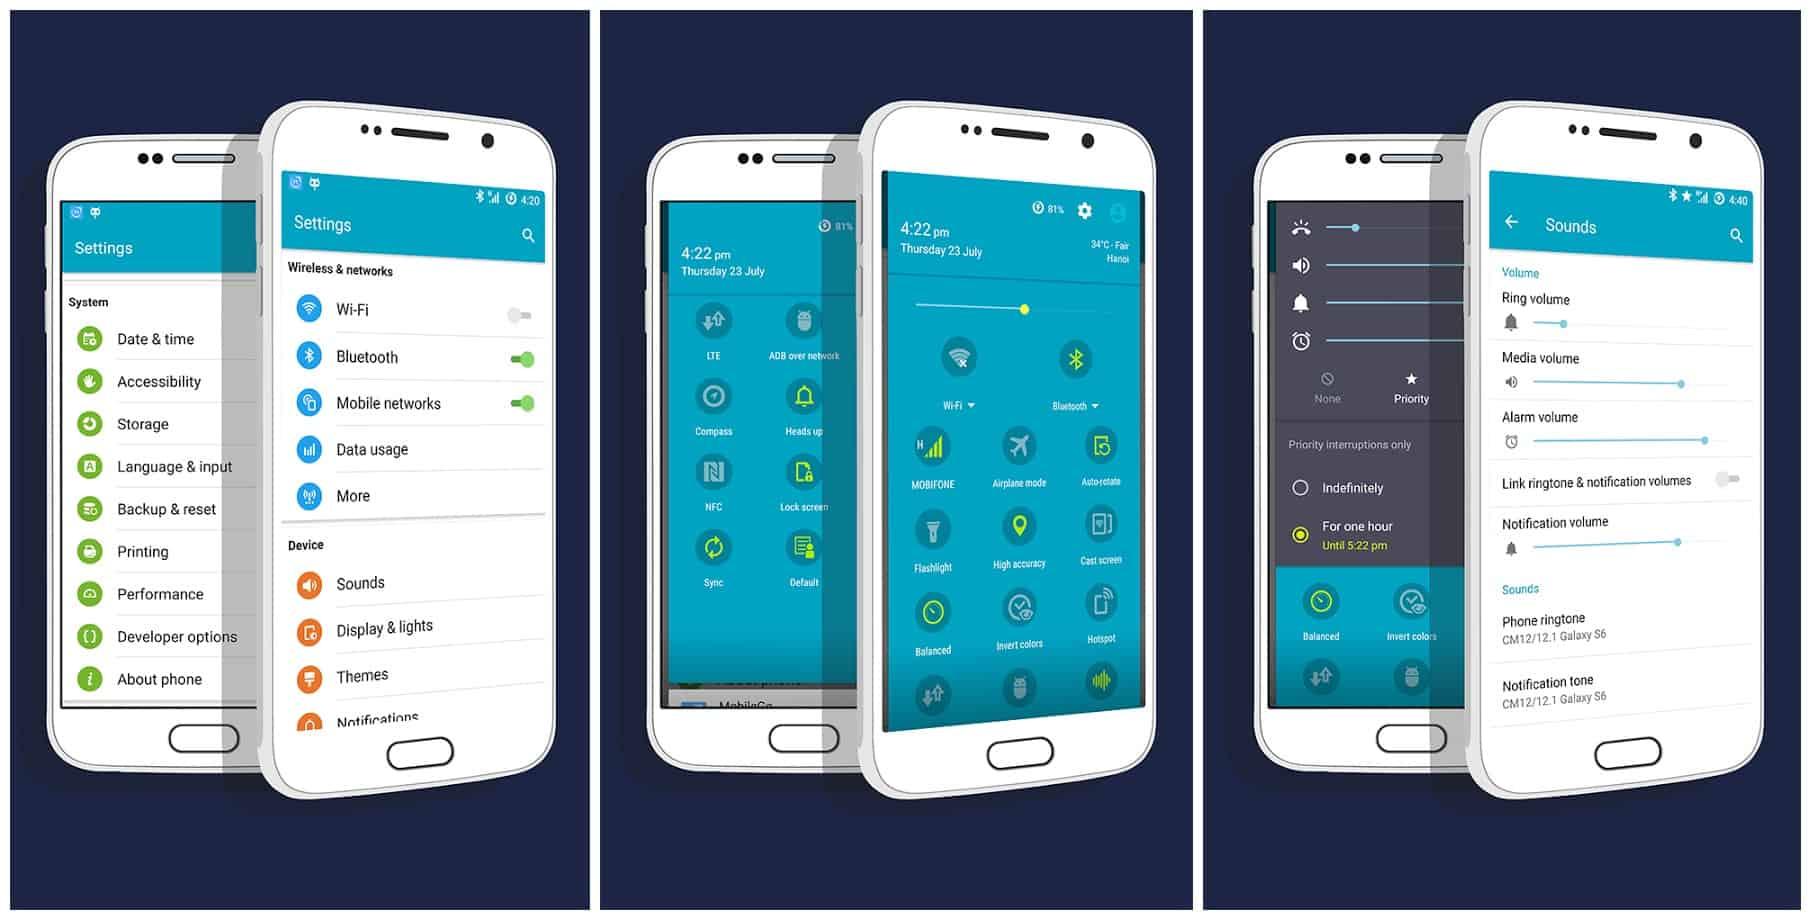 Galaxy S6 CM13 Theme